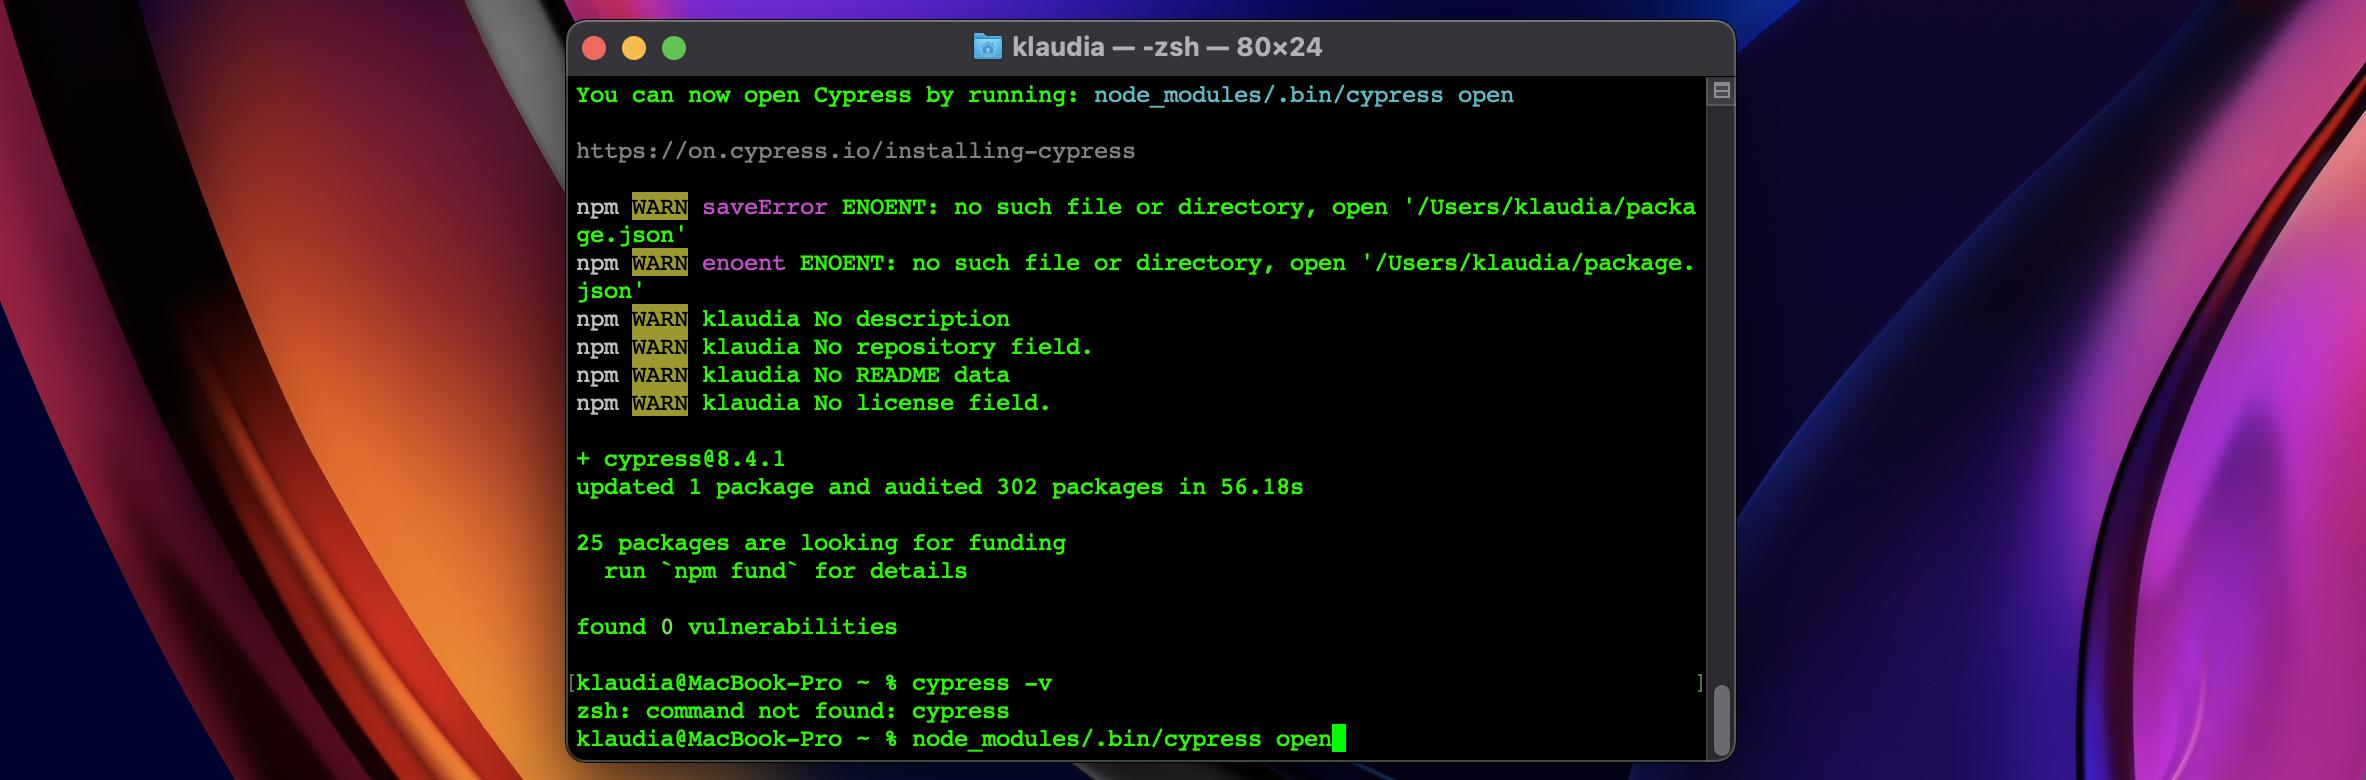 node_modules/.bin/cypress open command in terminal